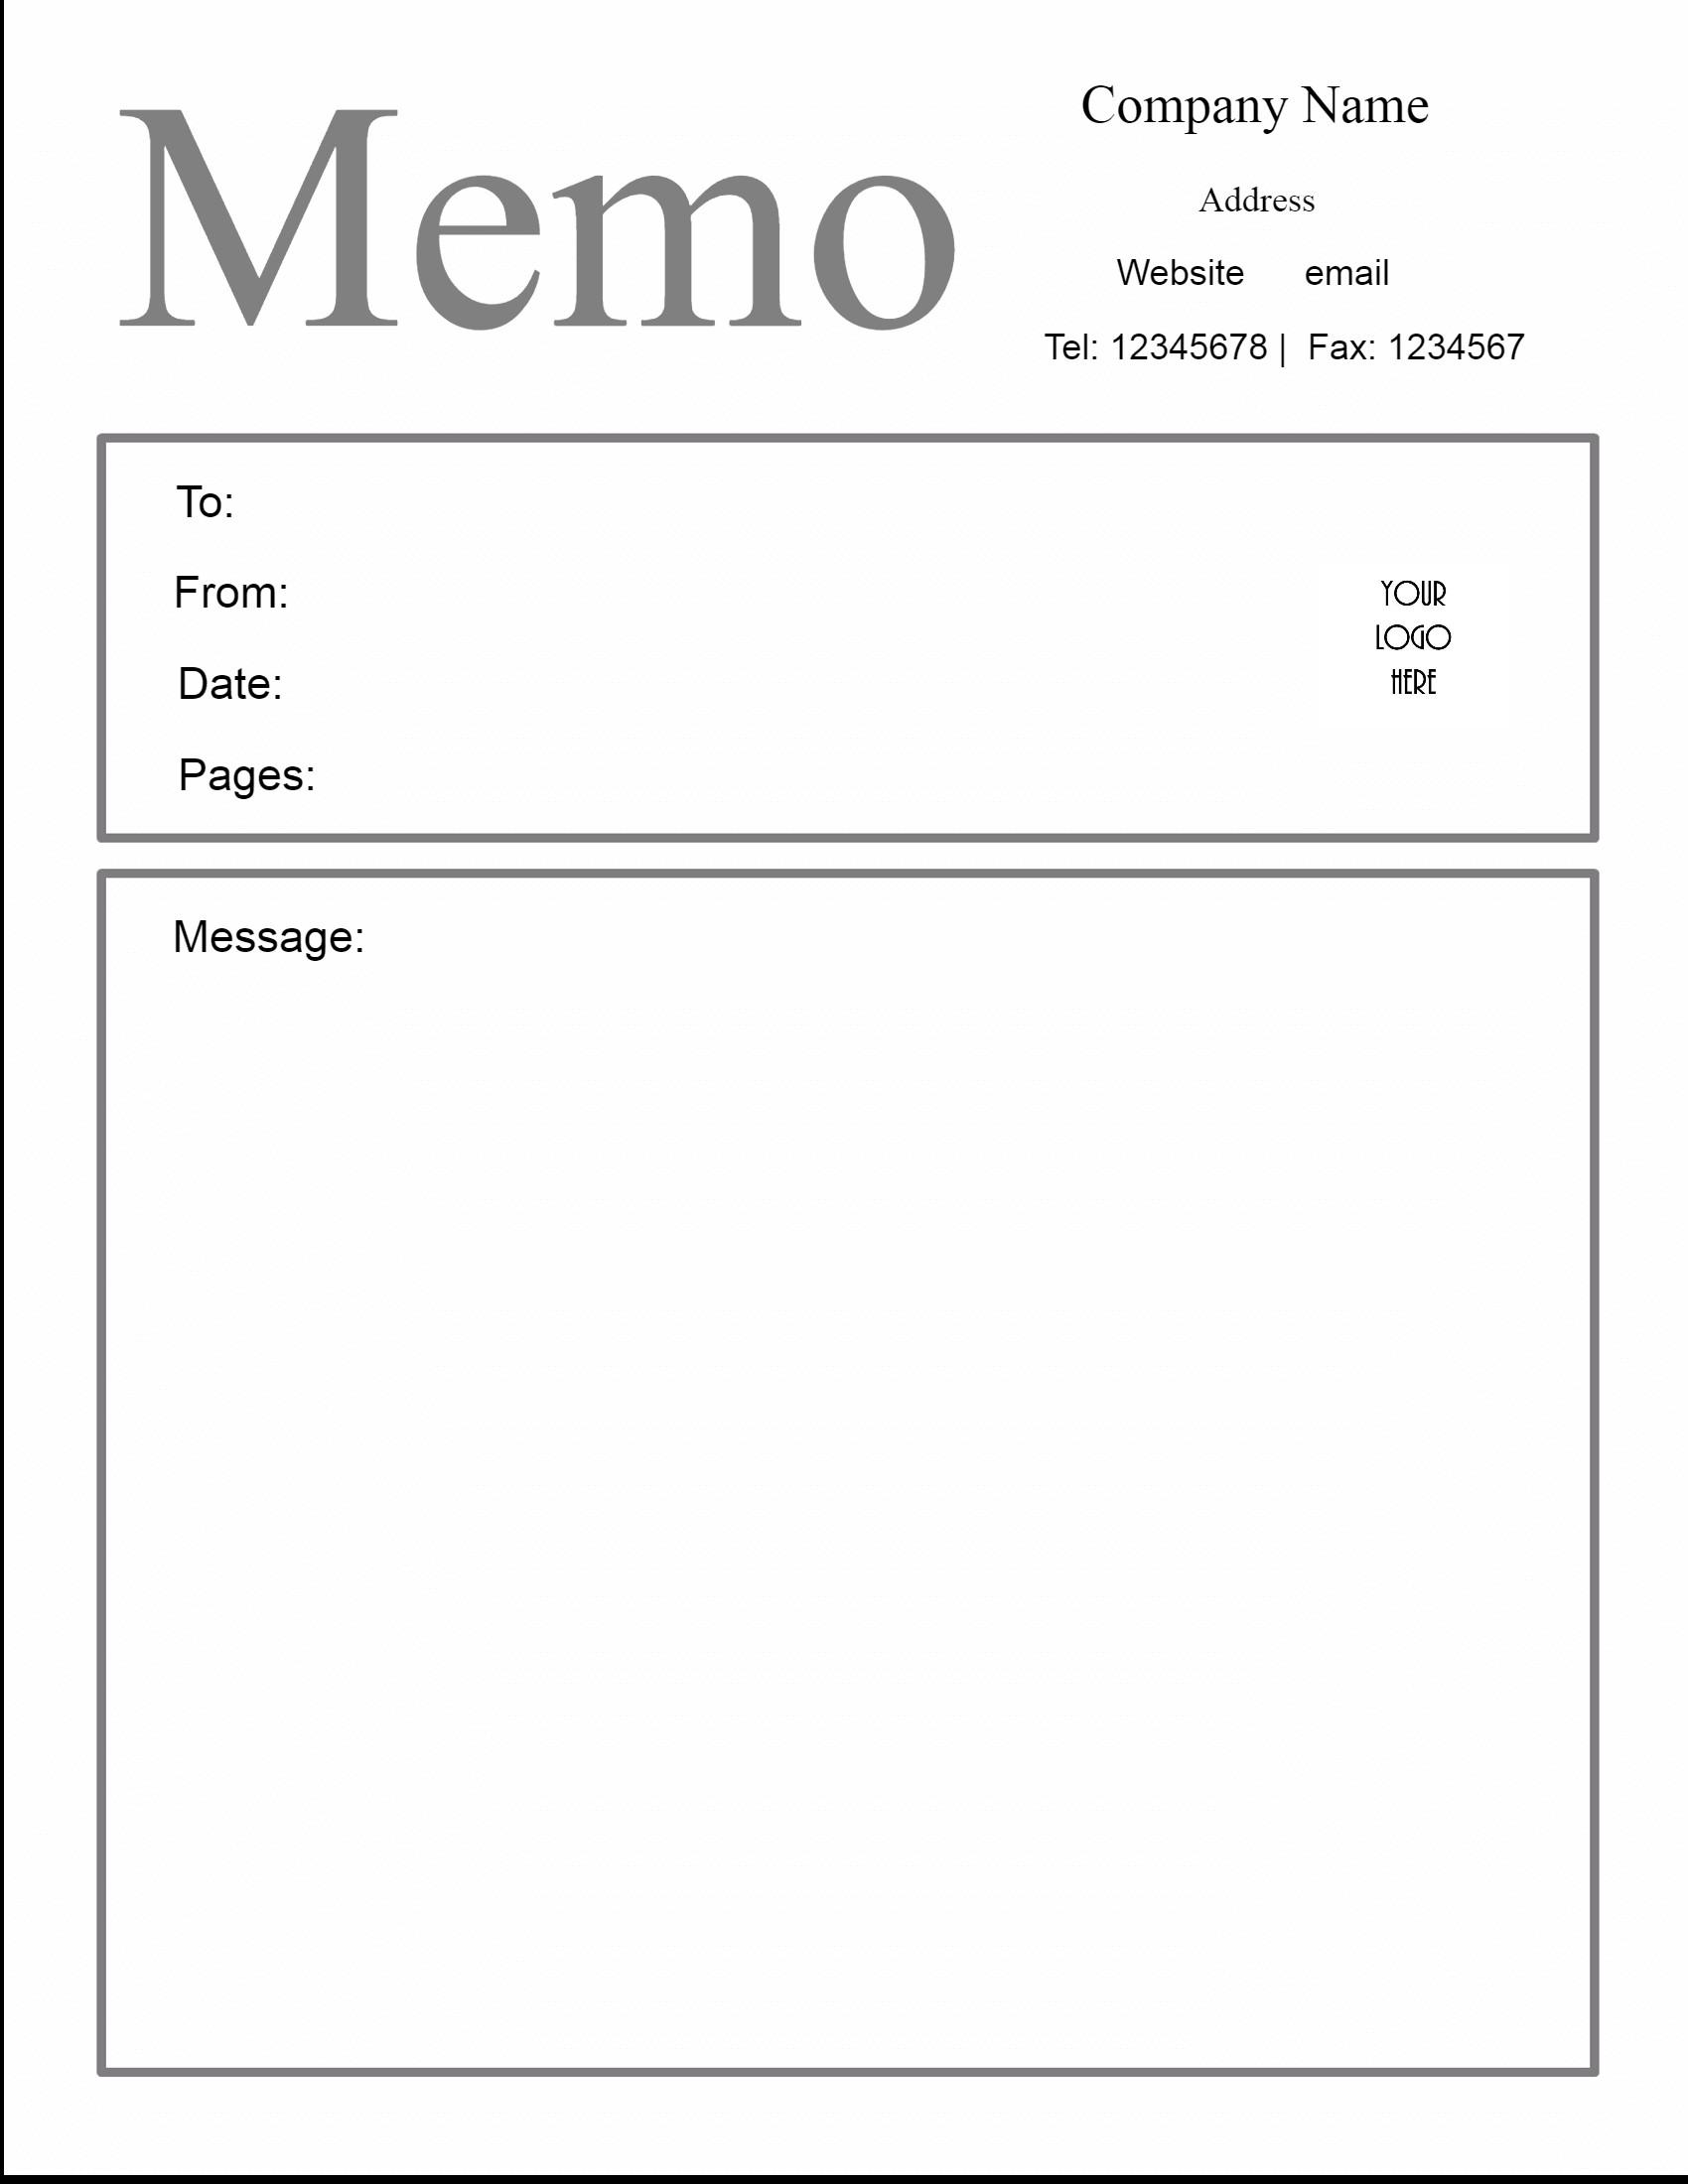 Microsoft Word Memorandum Template Free Microsoft Word Memo Template